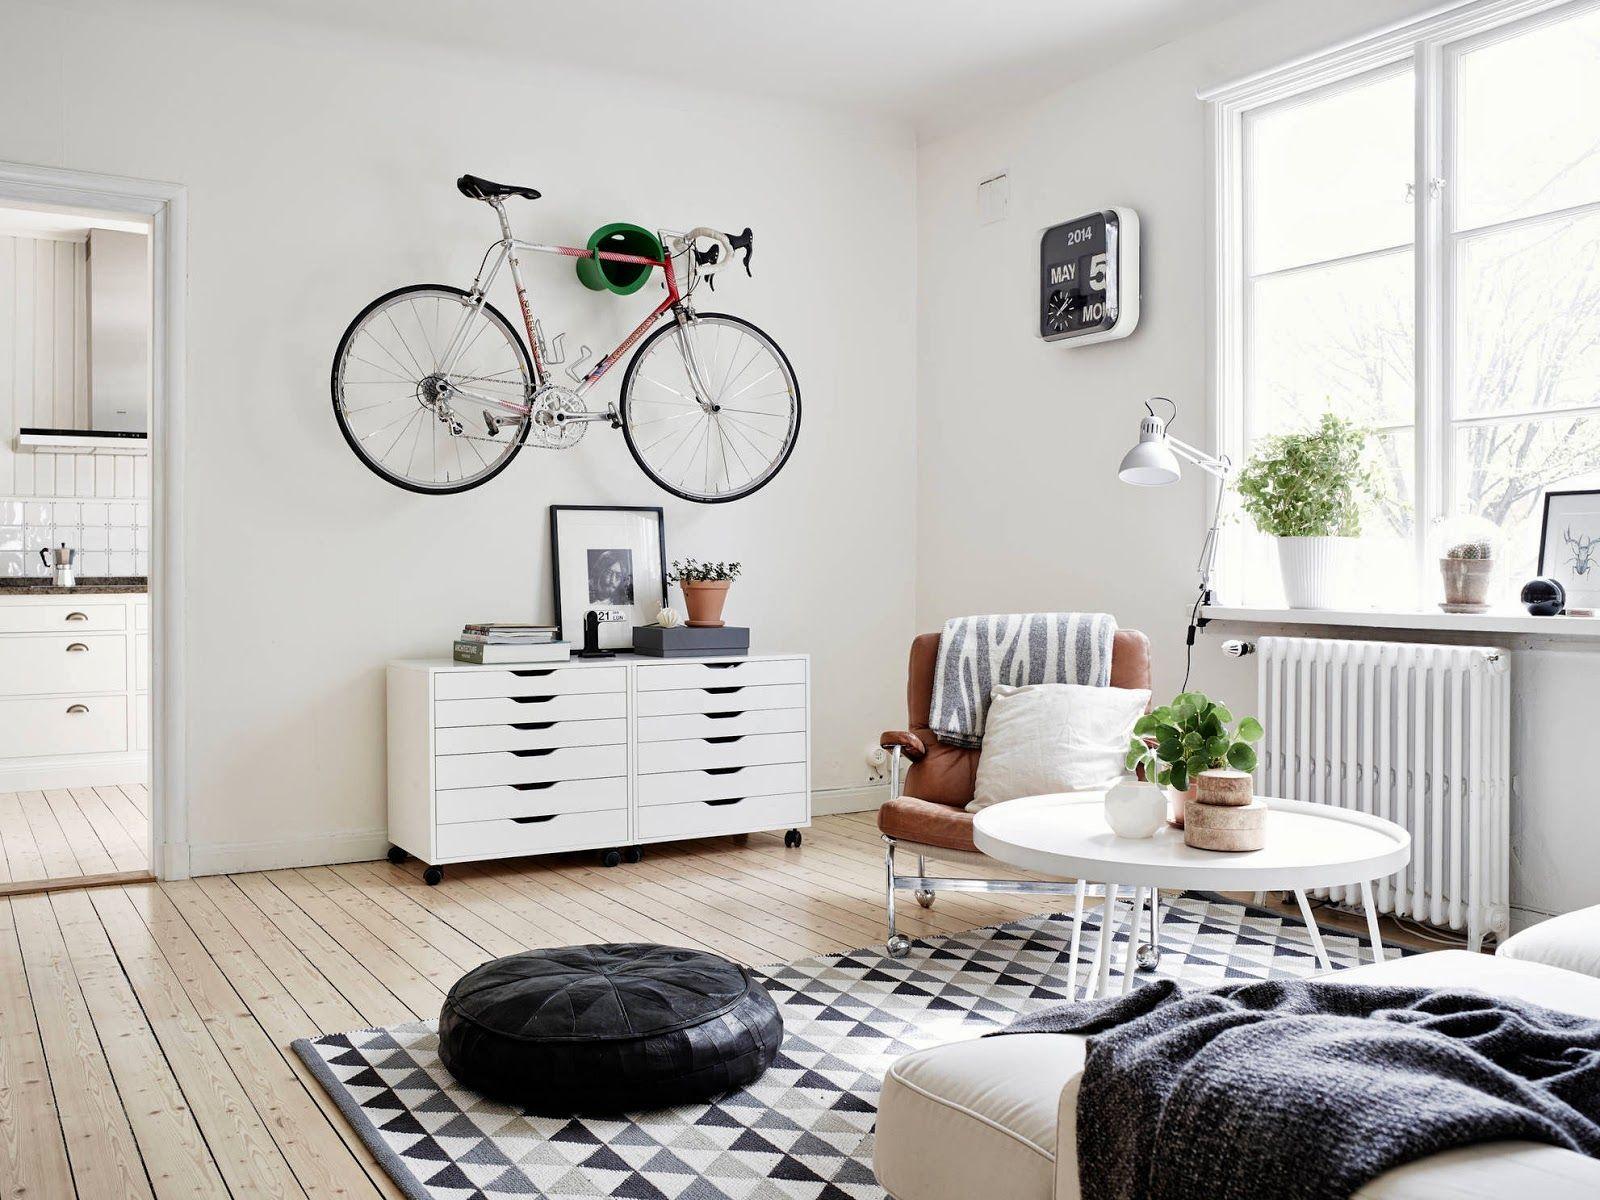 Design House Cosy Cozy Cottage Interiors Decor Decoration Living Minimalism